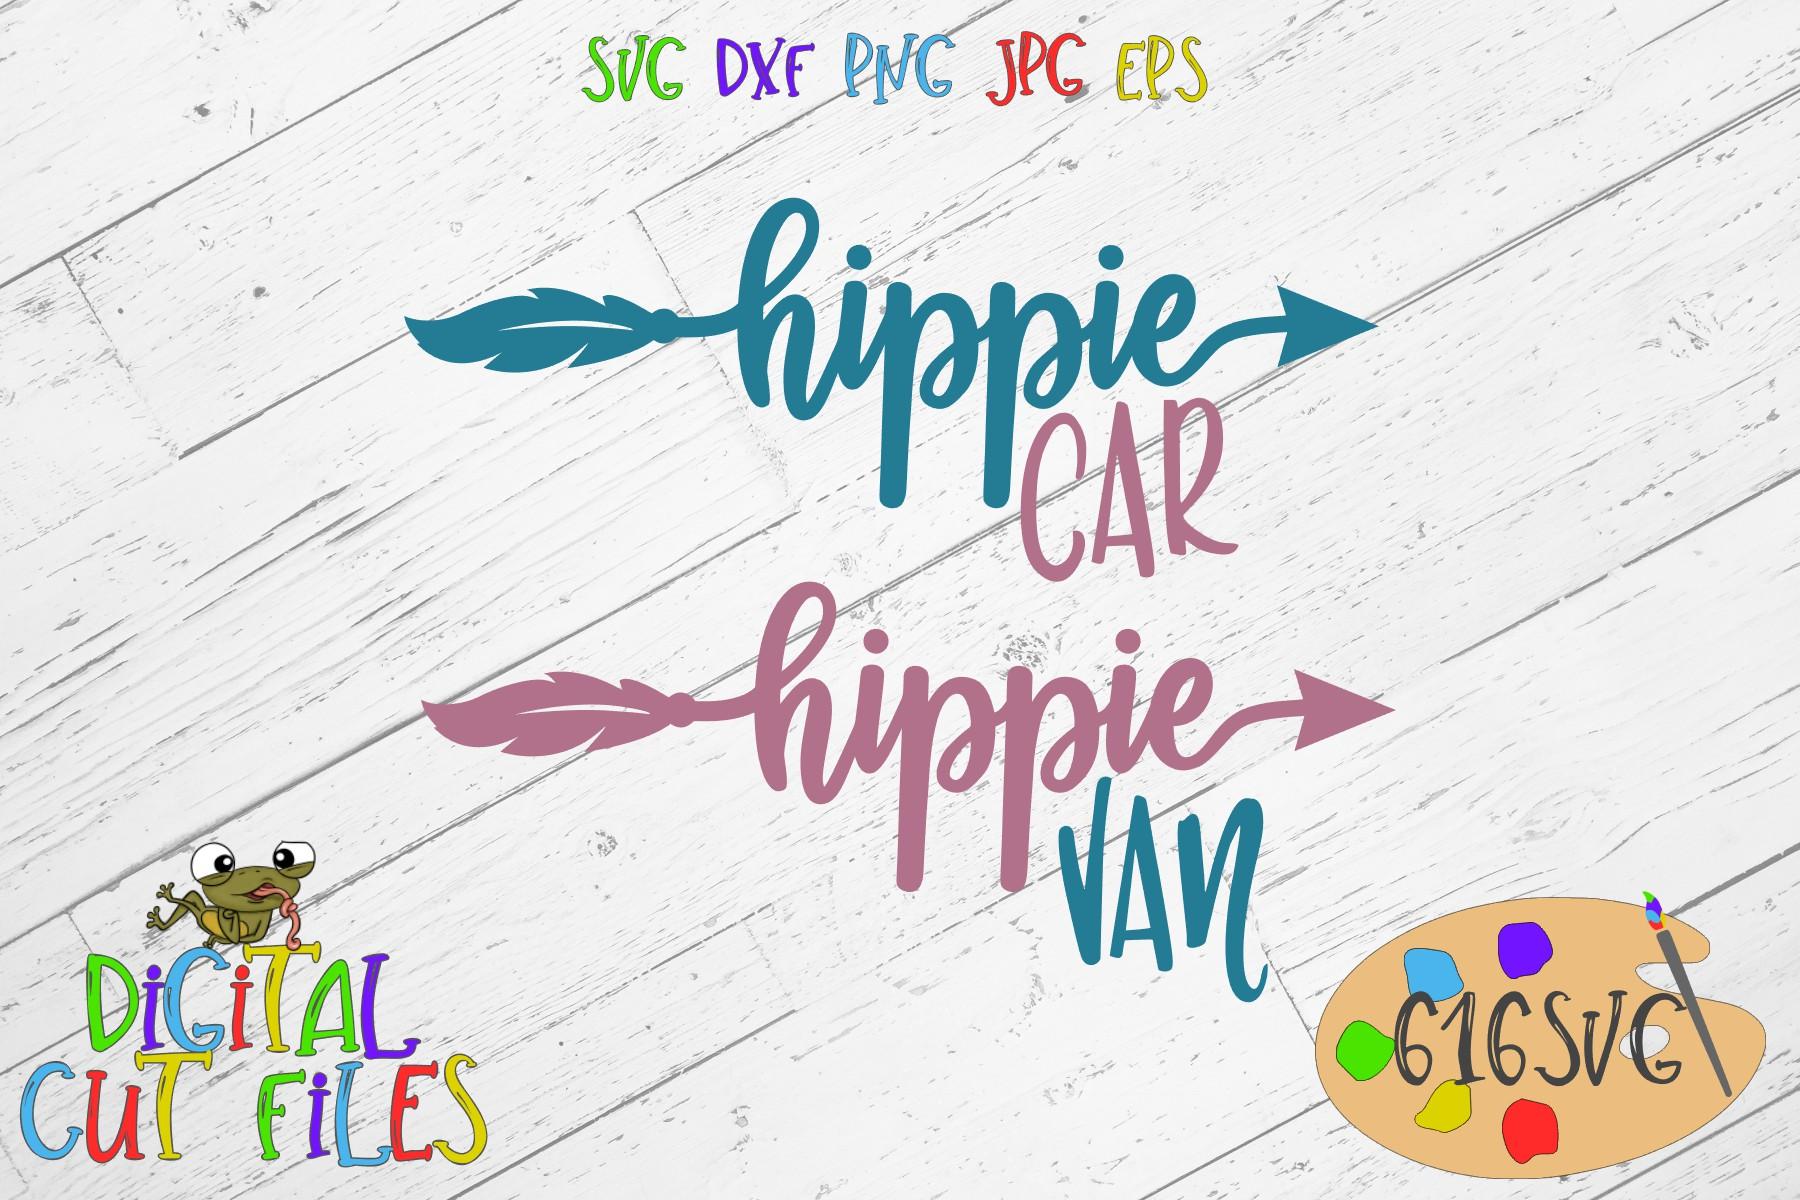 Hippie Car Hippie Van SVG example image 2